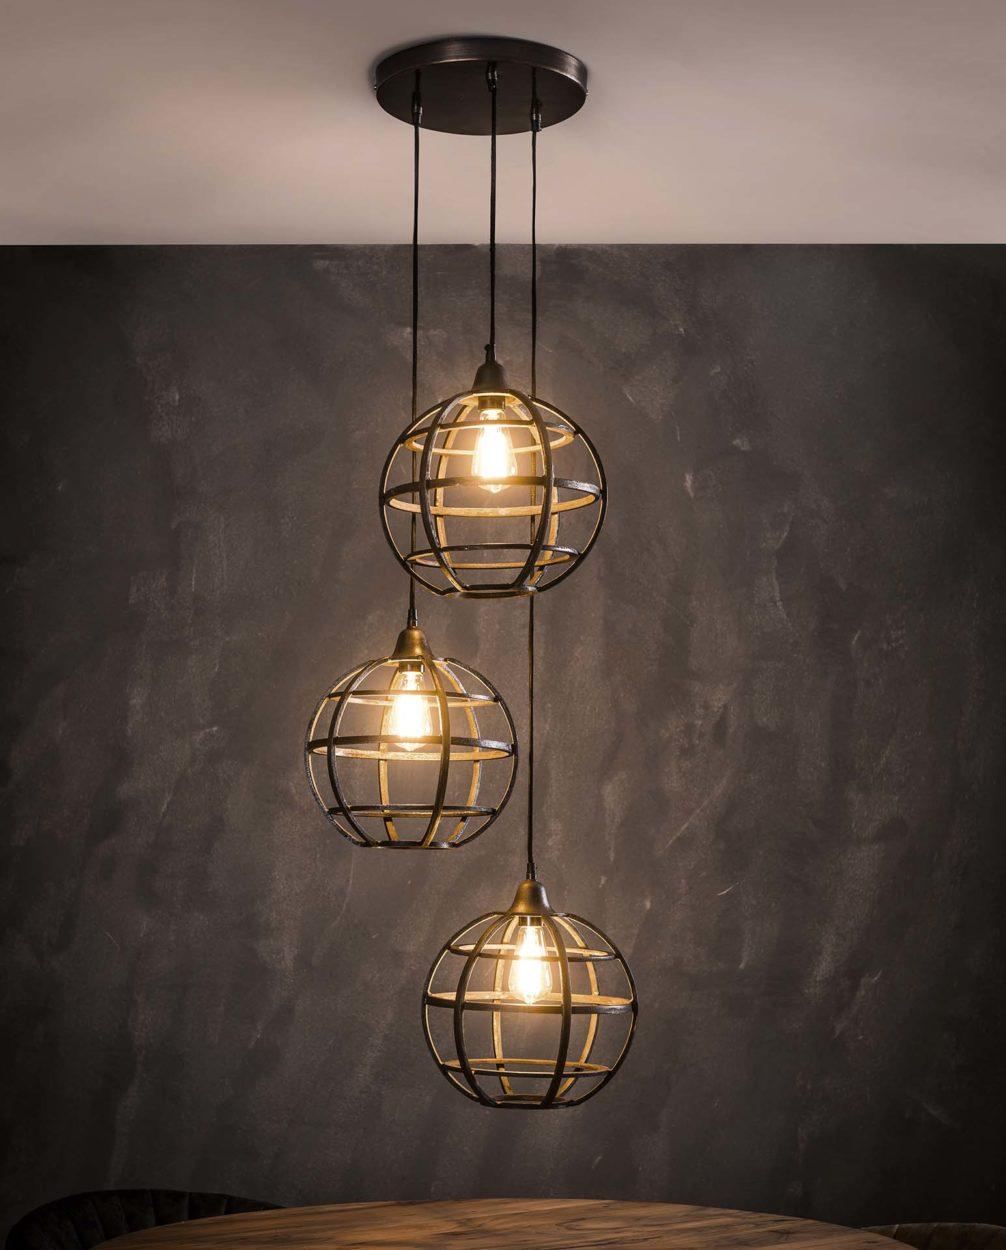 Globe hanglamp getrapt antiek koper finish